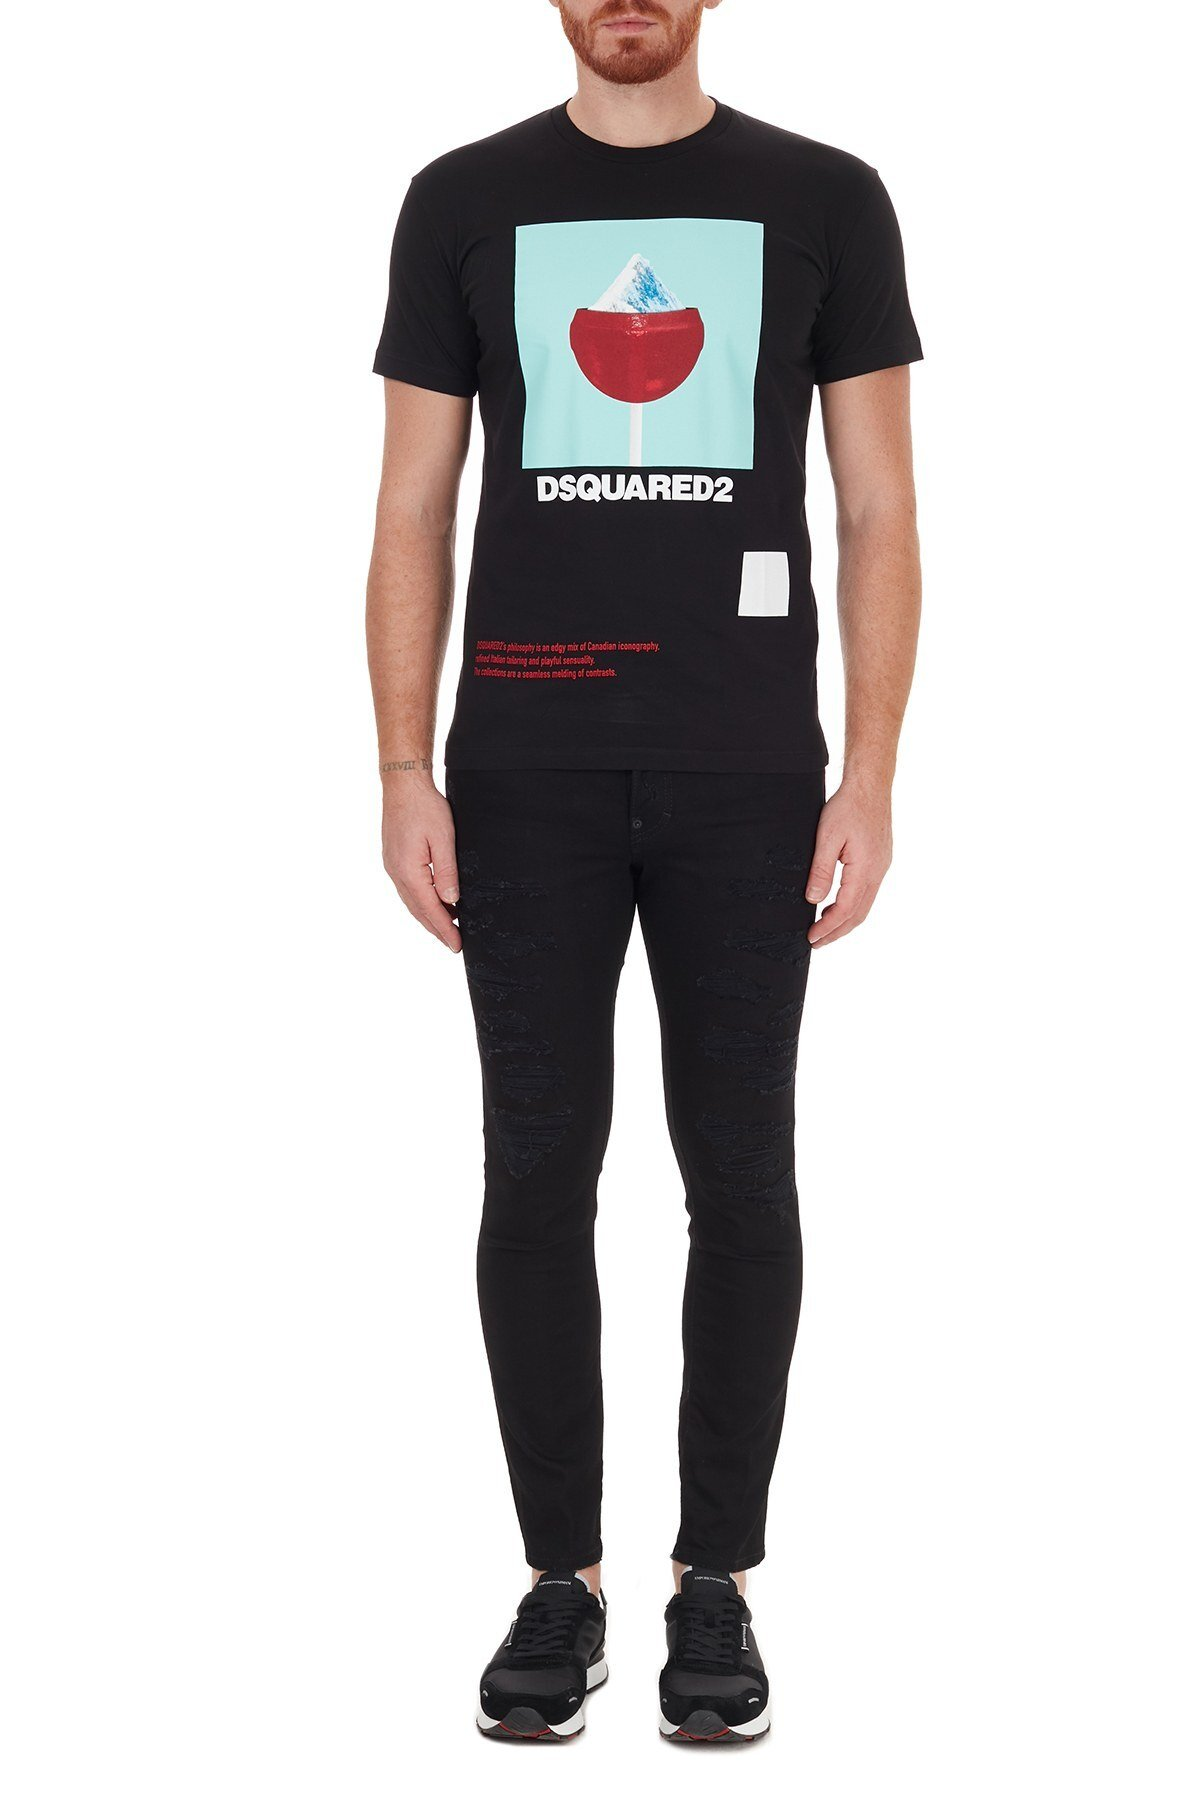 Dsquared2 Jeans Erkek Kot Pantolon S71LB0844 S30602 900 SİYAH